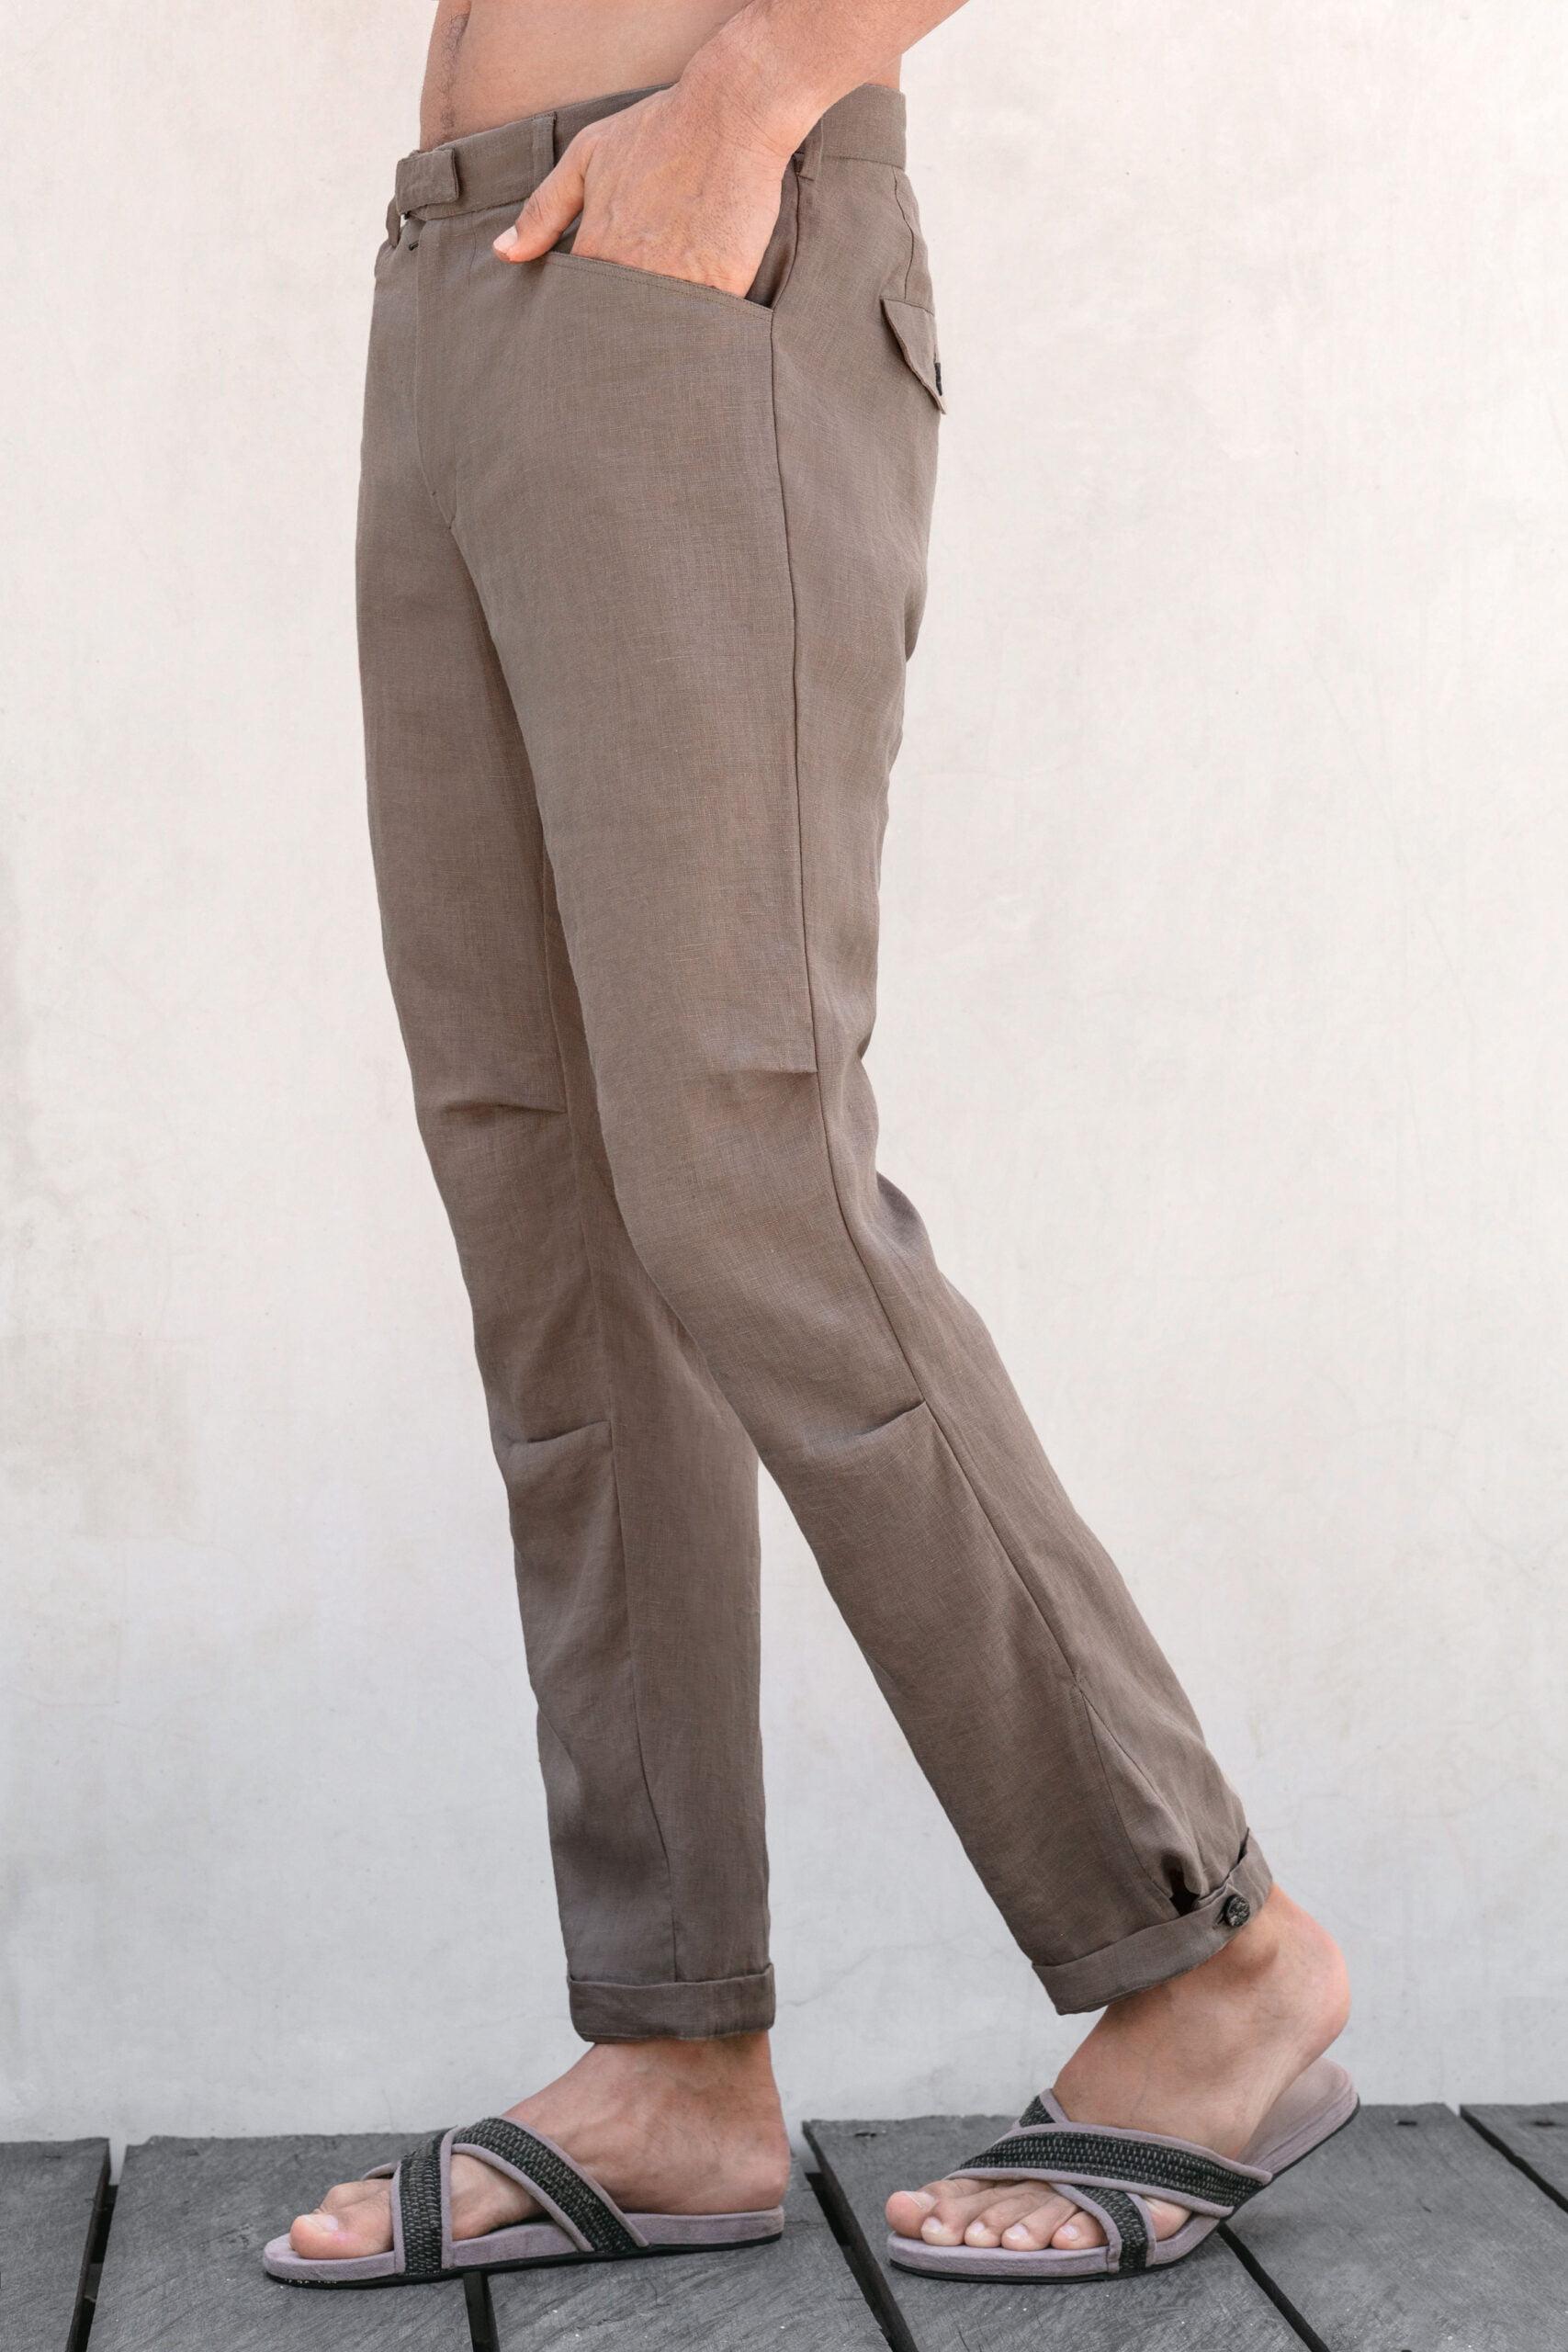 Abr knee darted linen pants brown